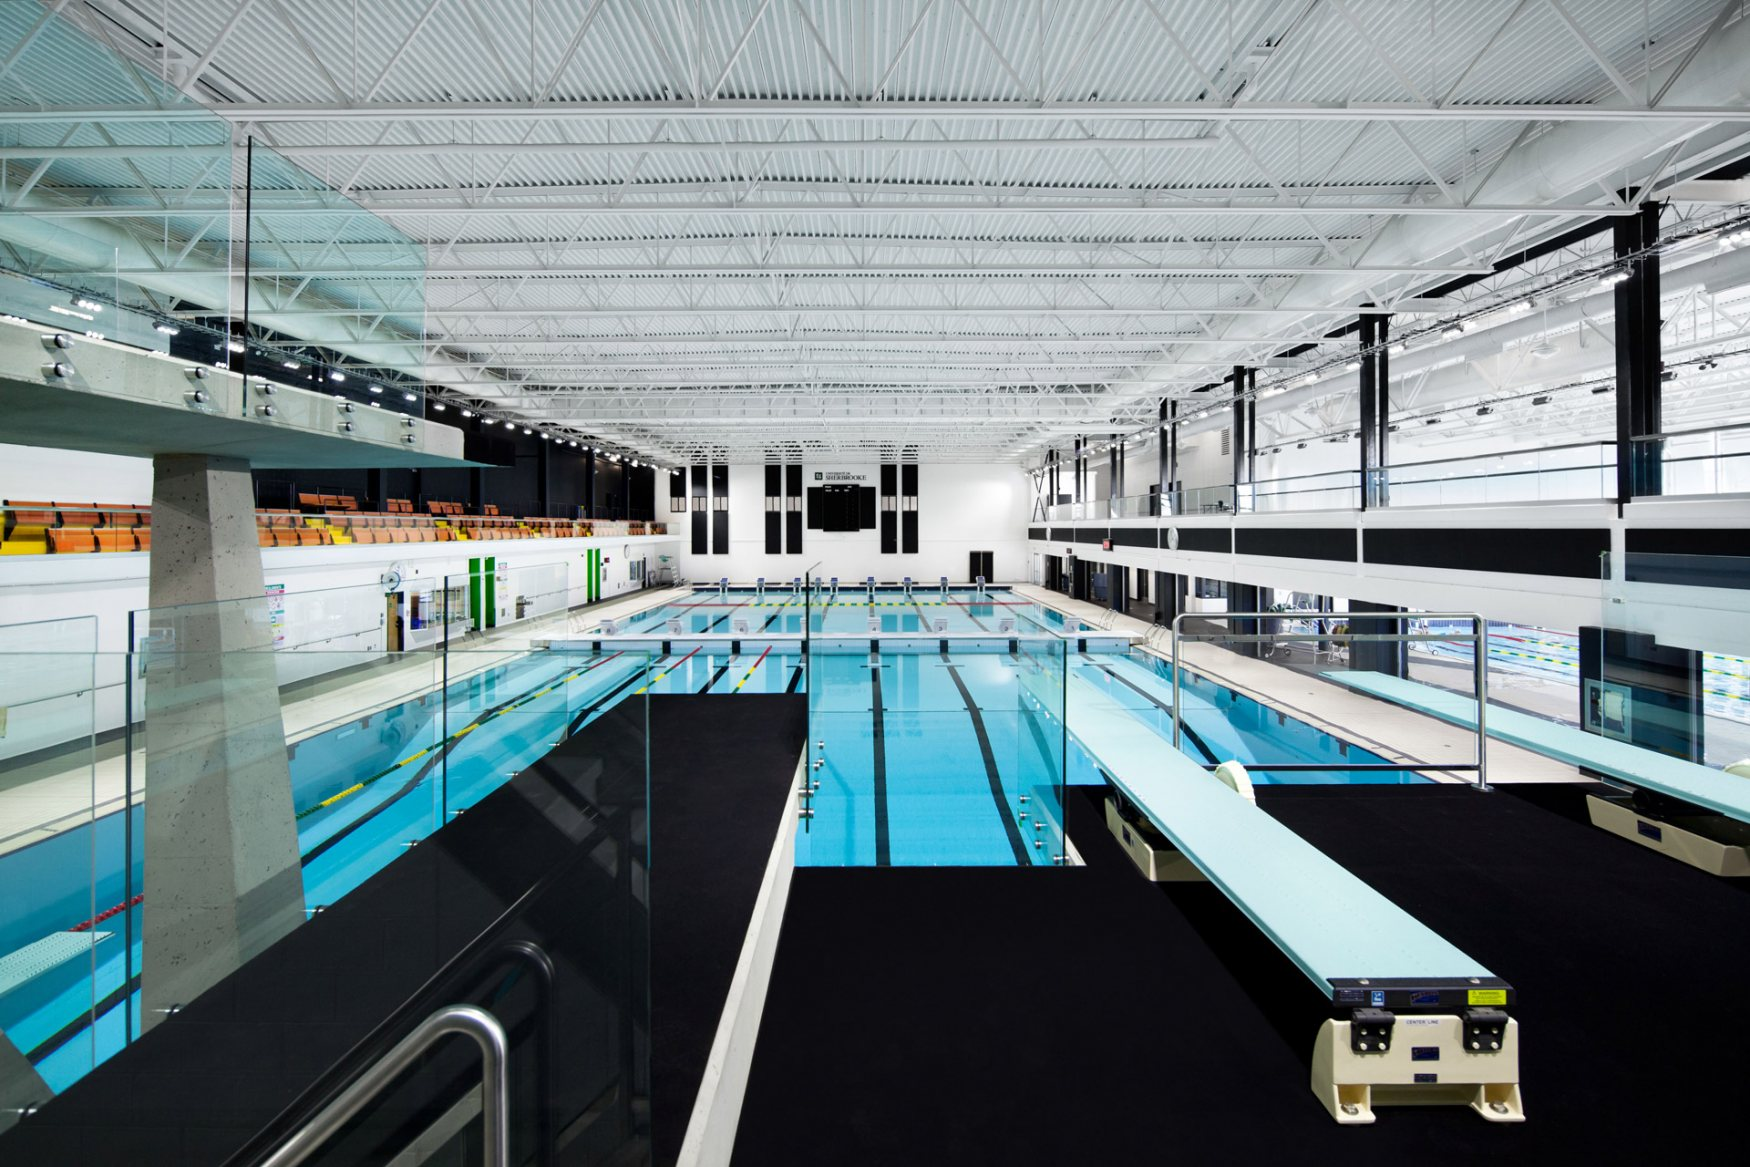 Sherbrooke University pool complex